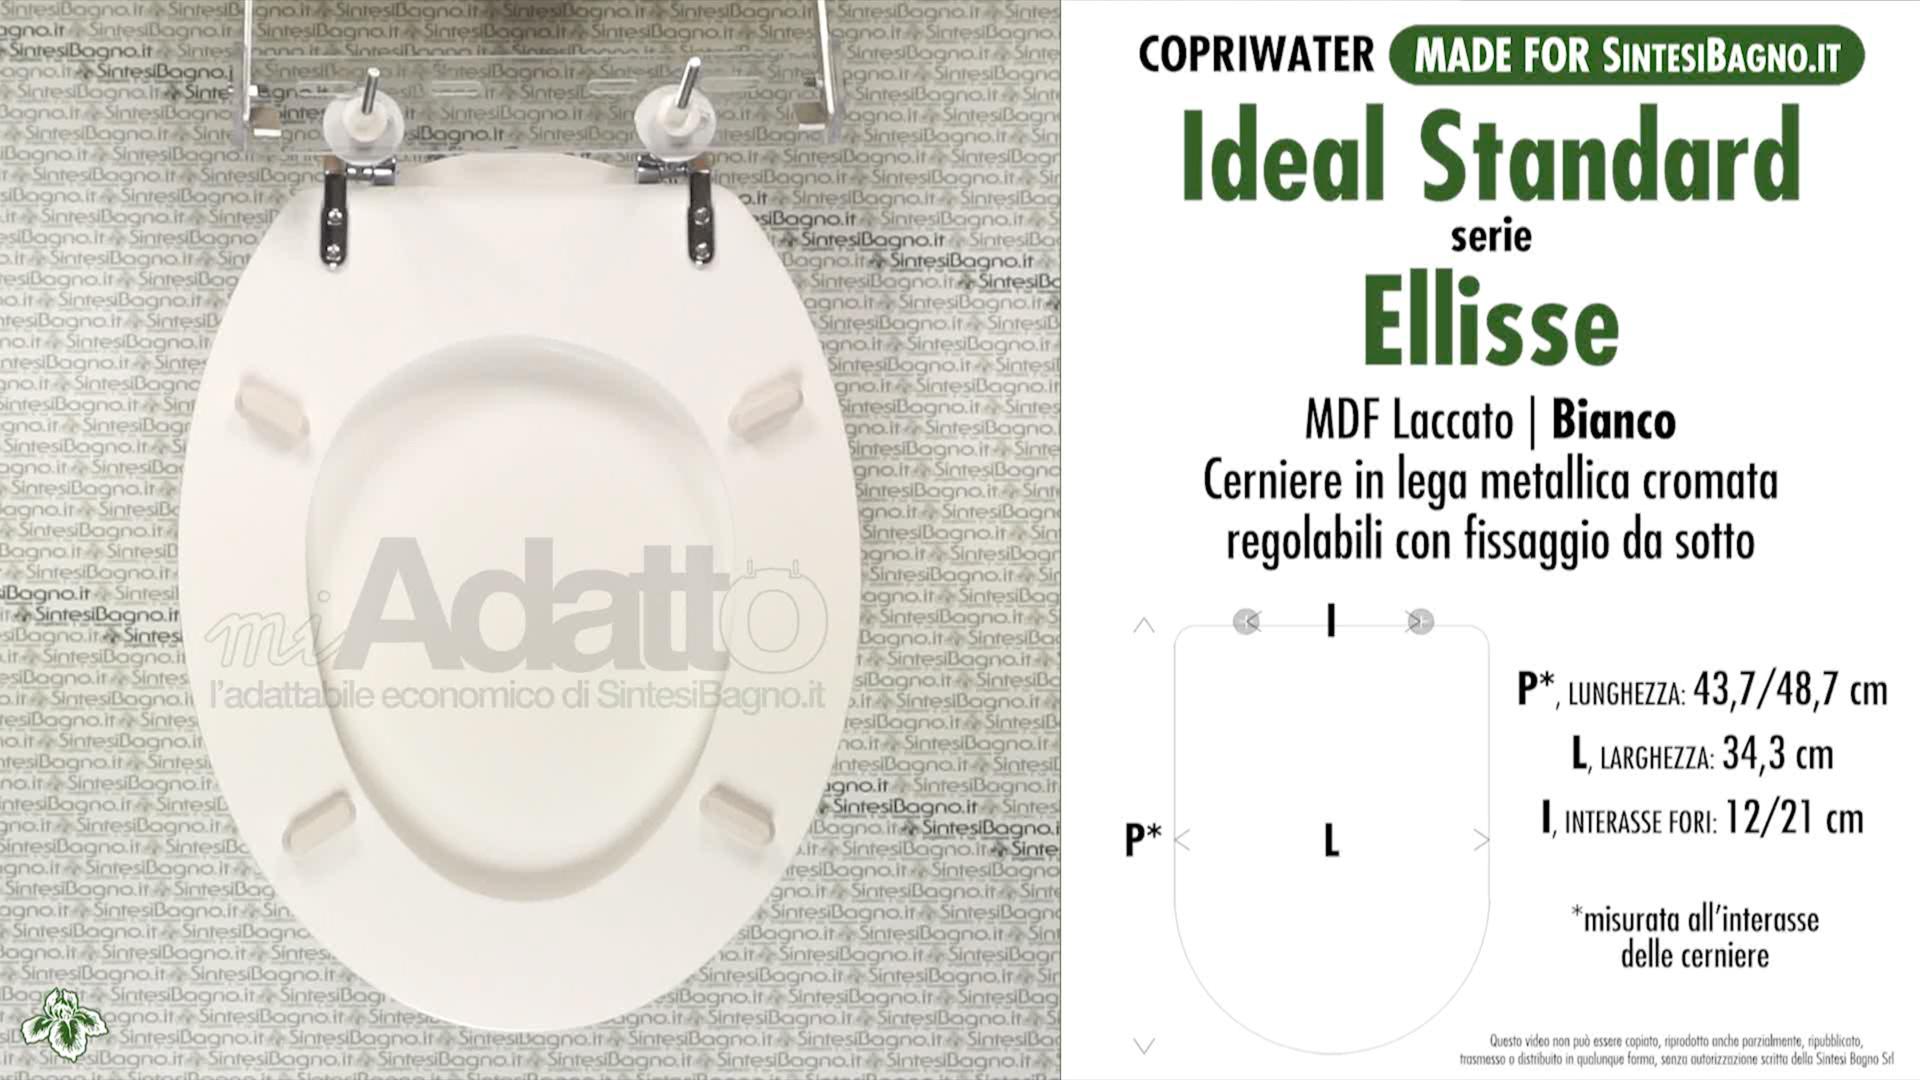 Copriwater Per Wc Ellisse Ideal Standard Bianco Tipo Adattabile